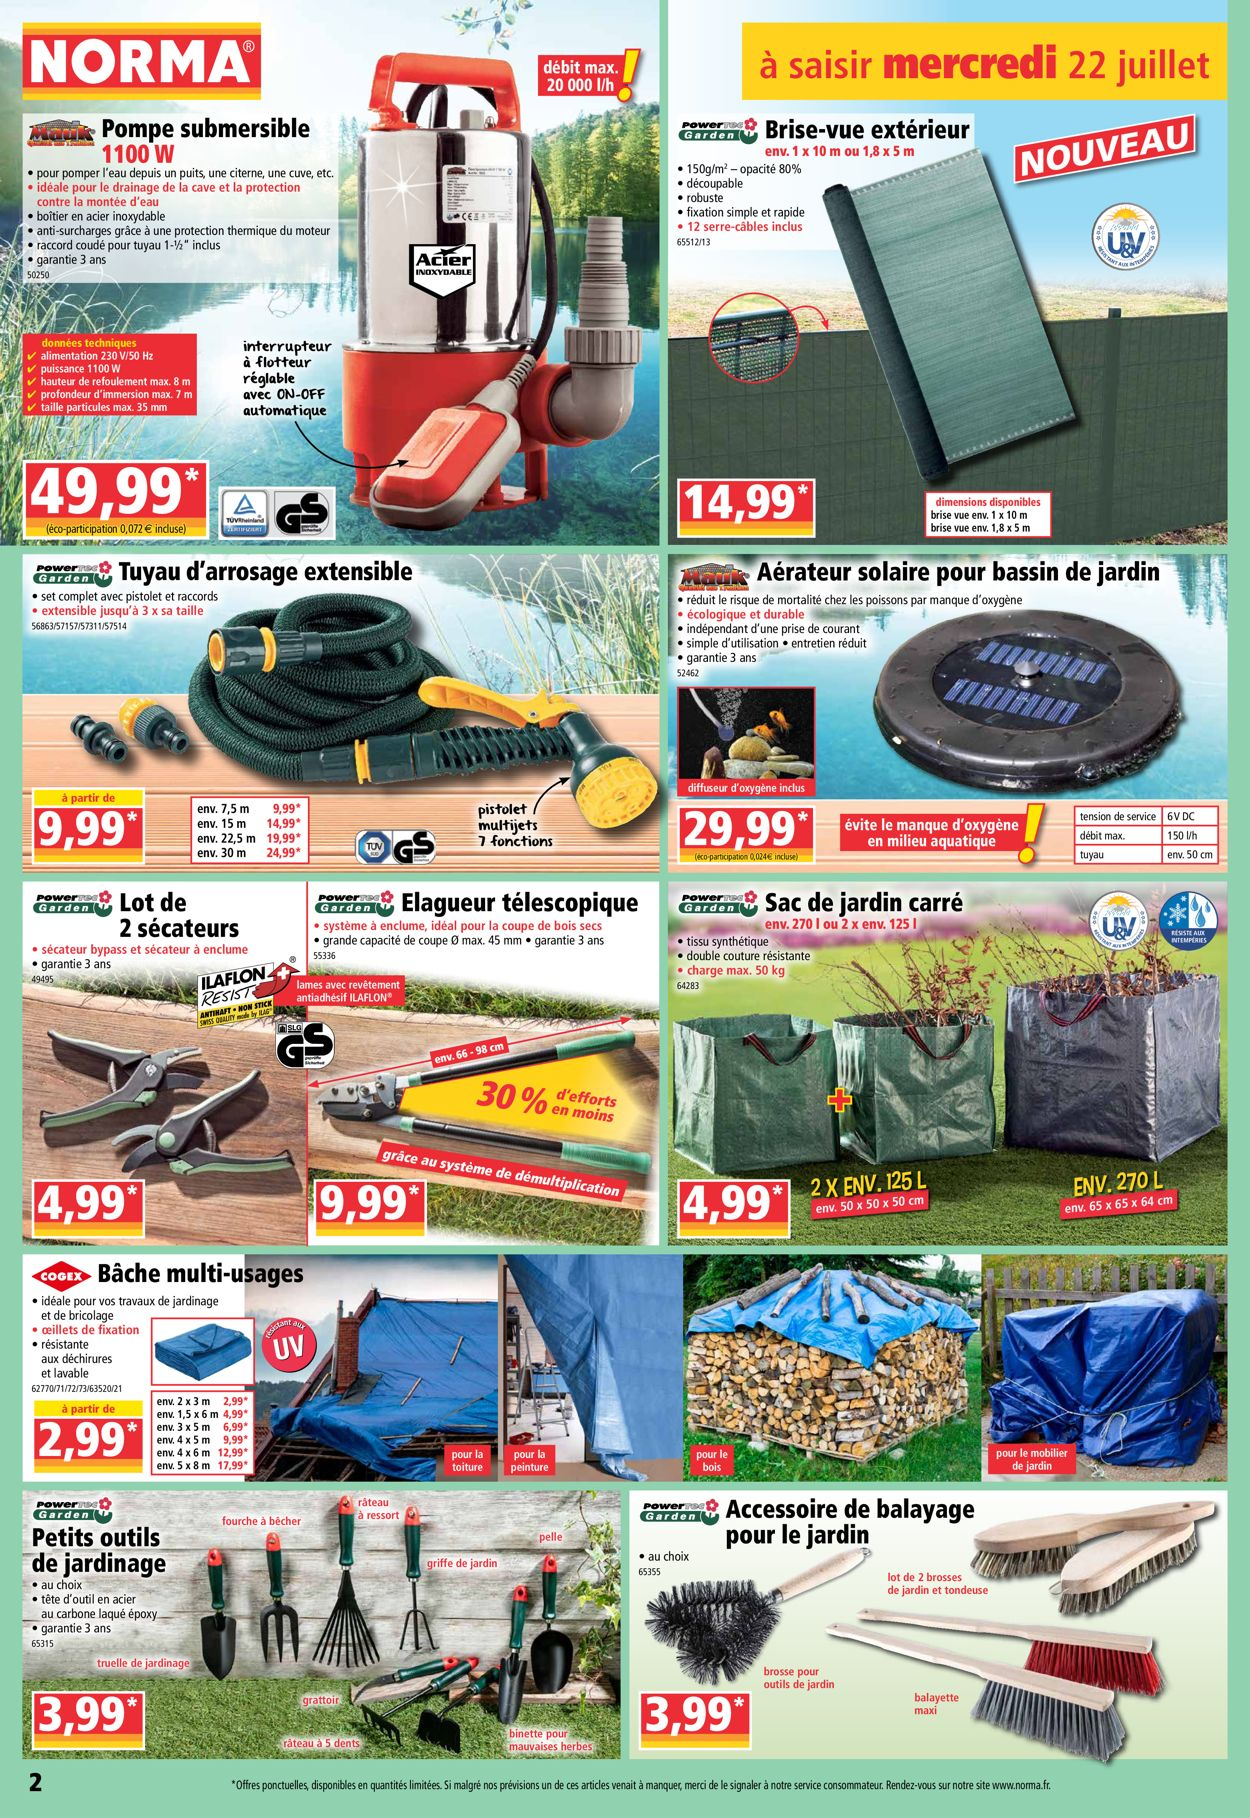 Norma Catalogue - 22.07-29.07.2020 (Page 2)